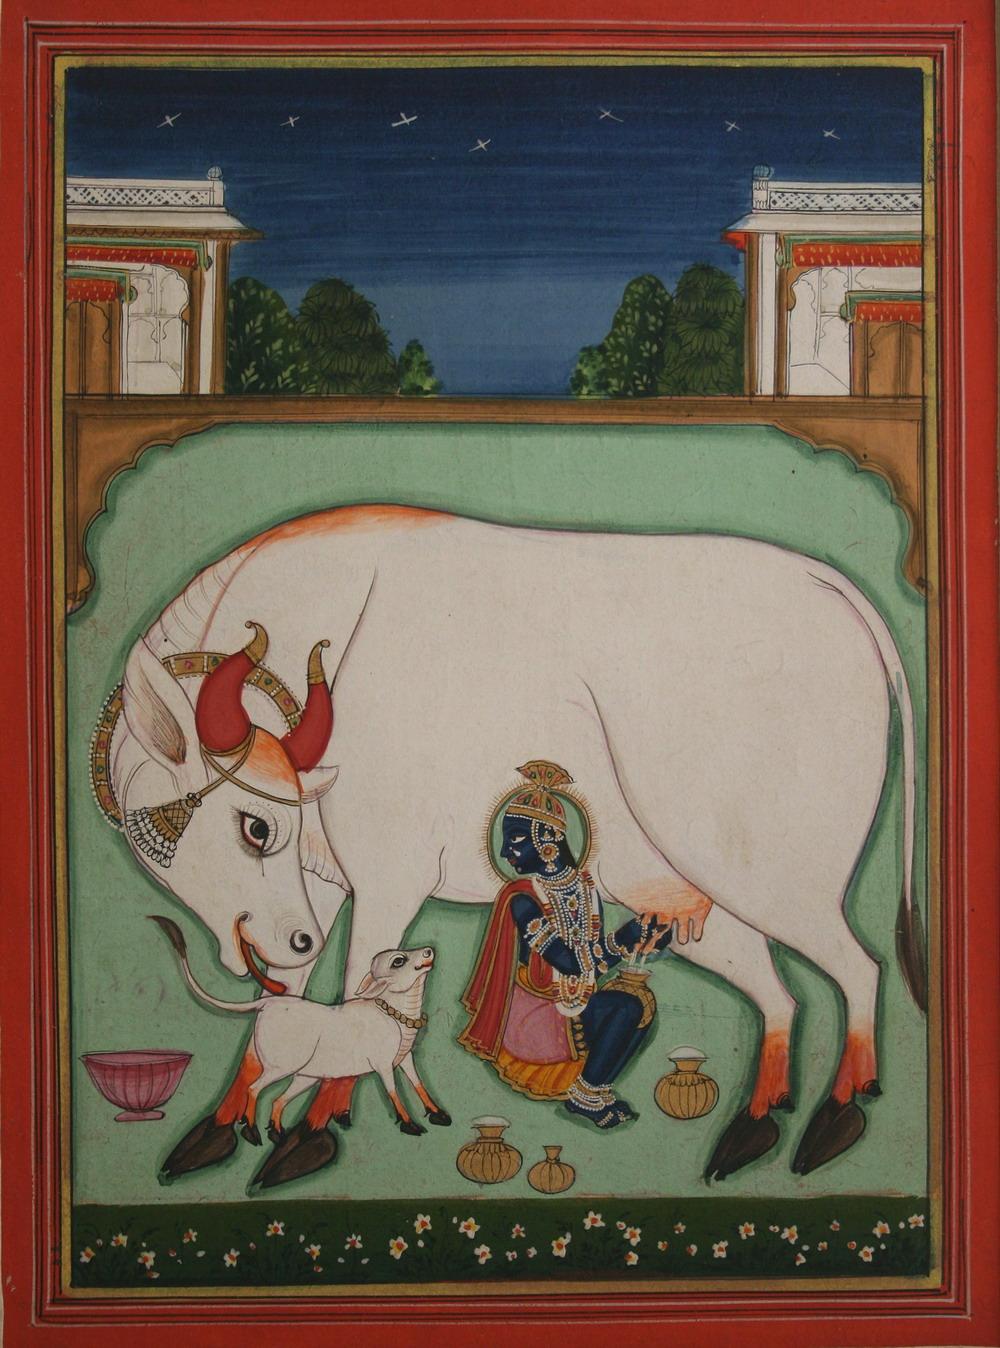 Krishna Milking a Cow - Rajput Painting, NathDwara, c1820